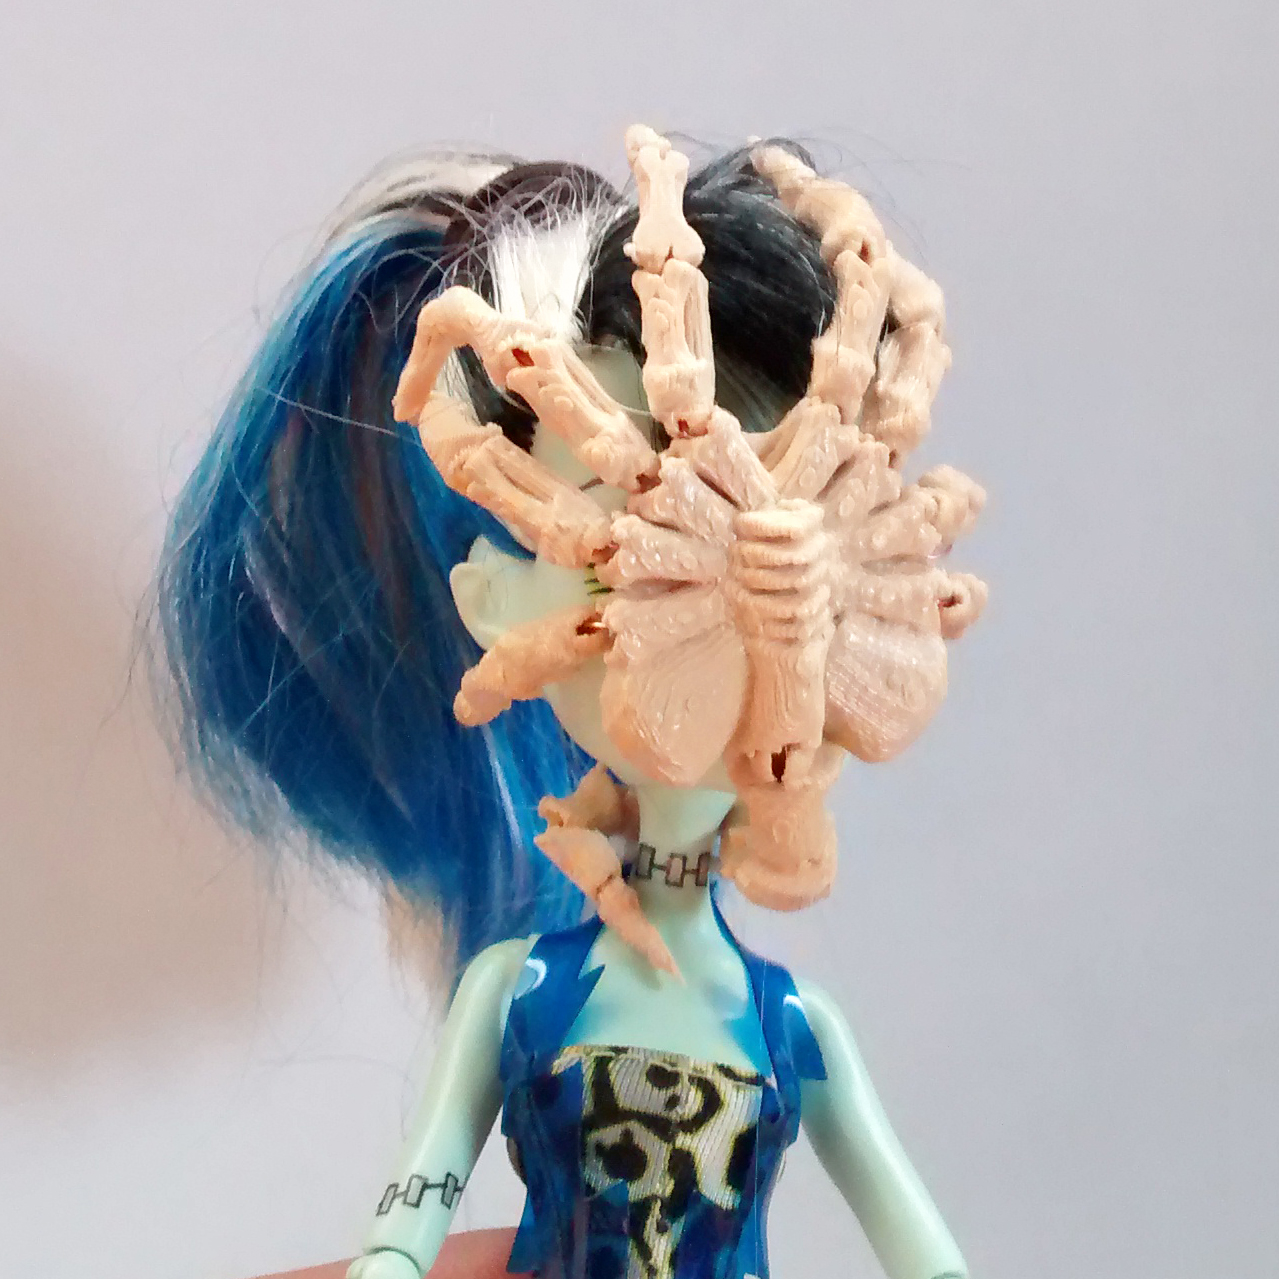 Mini 3D printed Face Hugger by Julie Sharpe